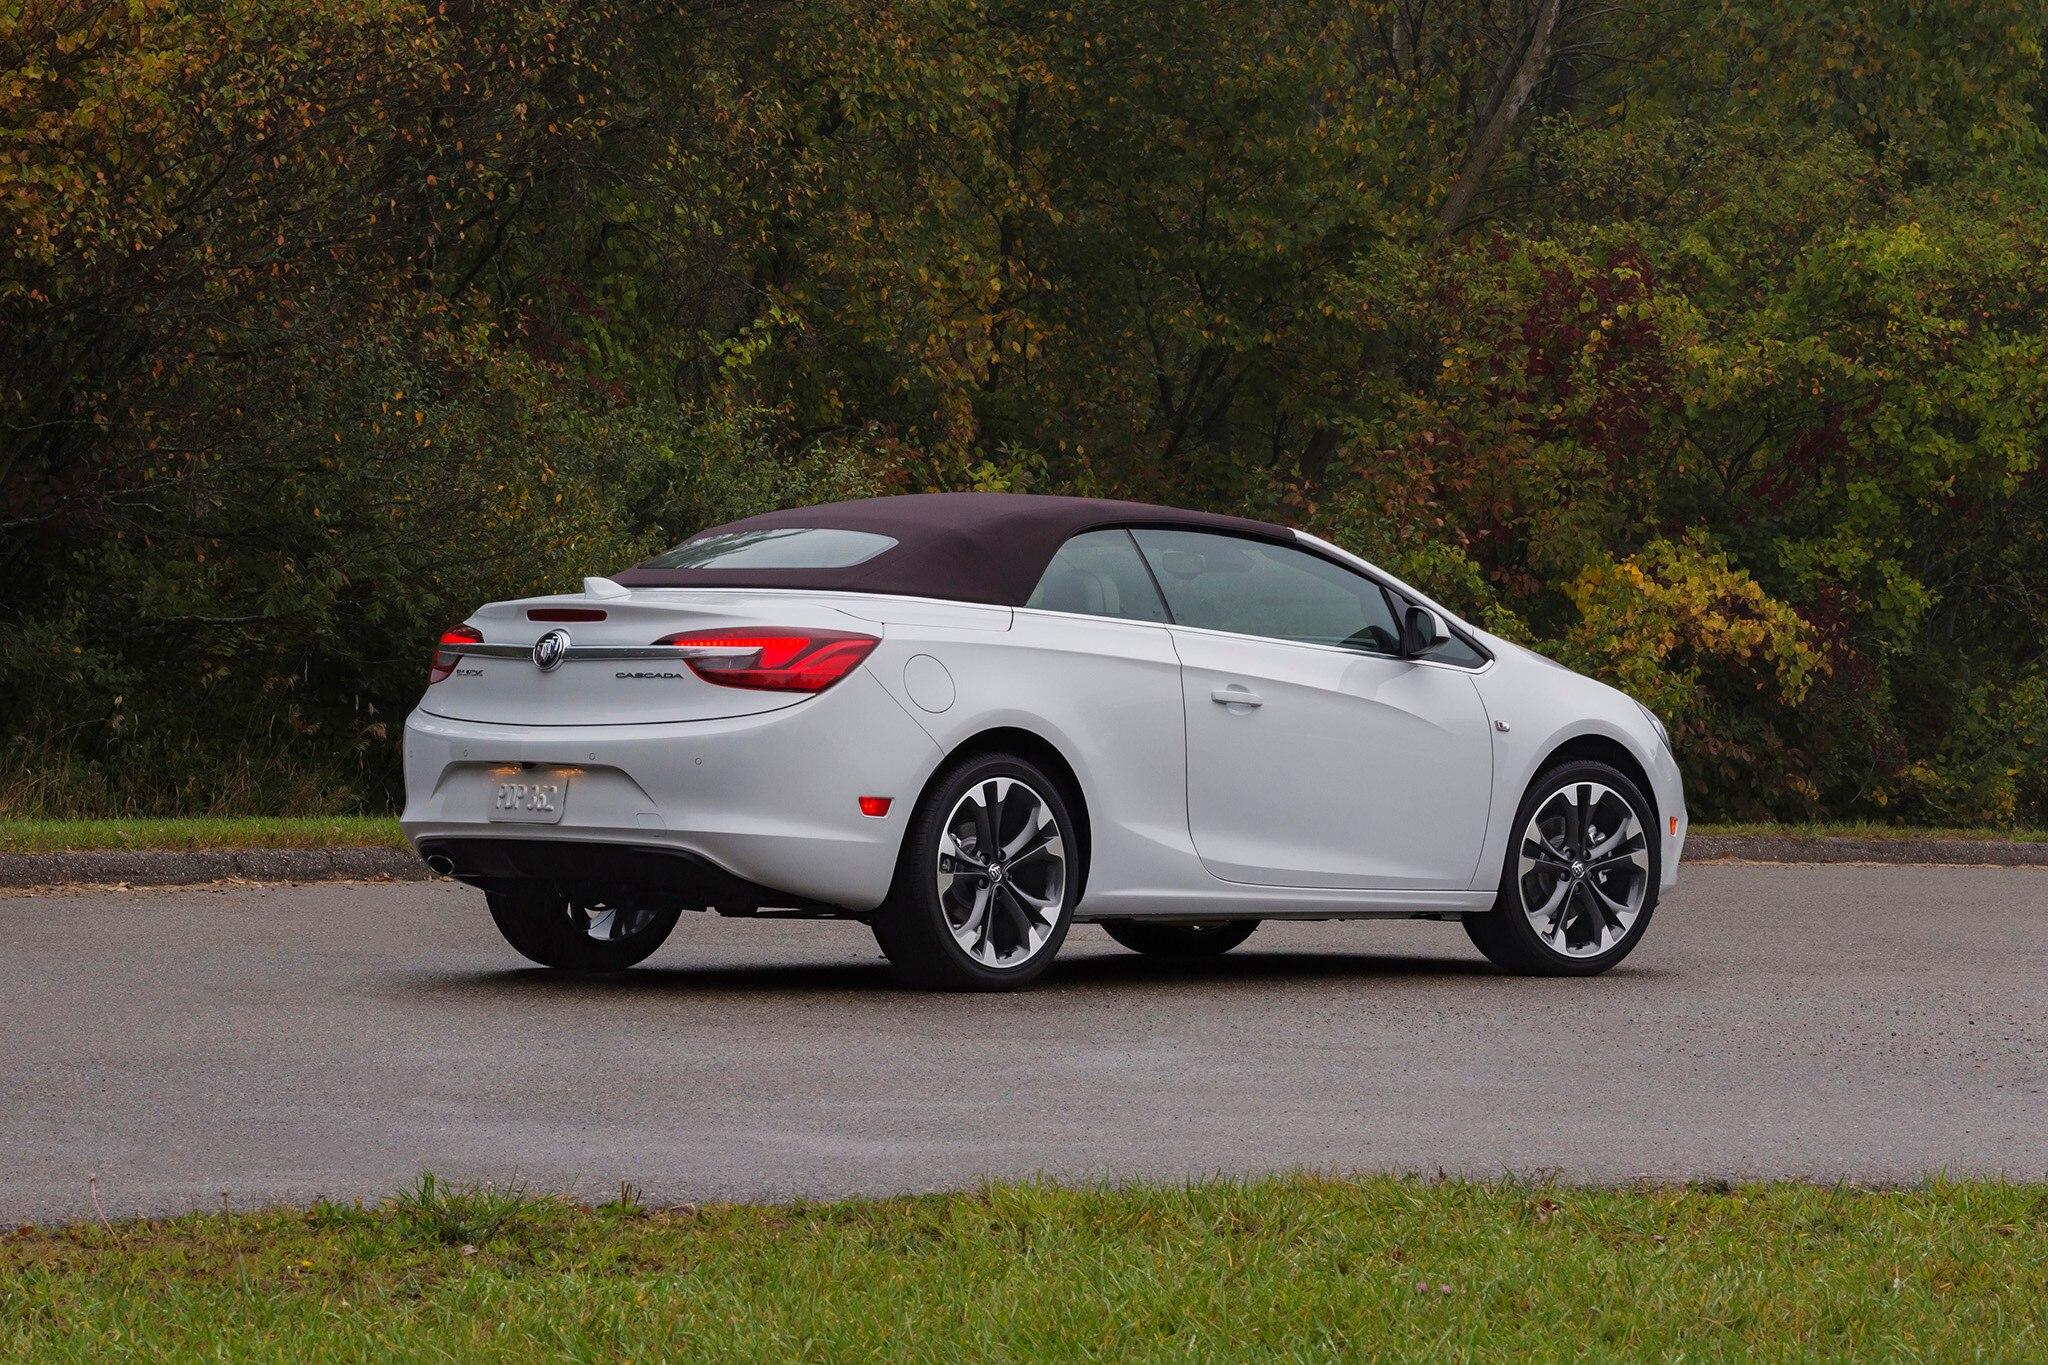 2018 Buick Cascada White Rear Three Quarters